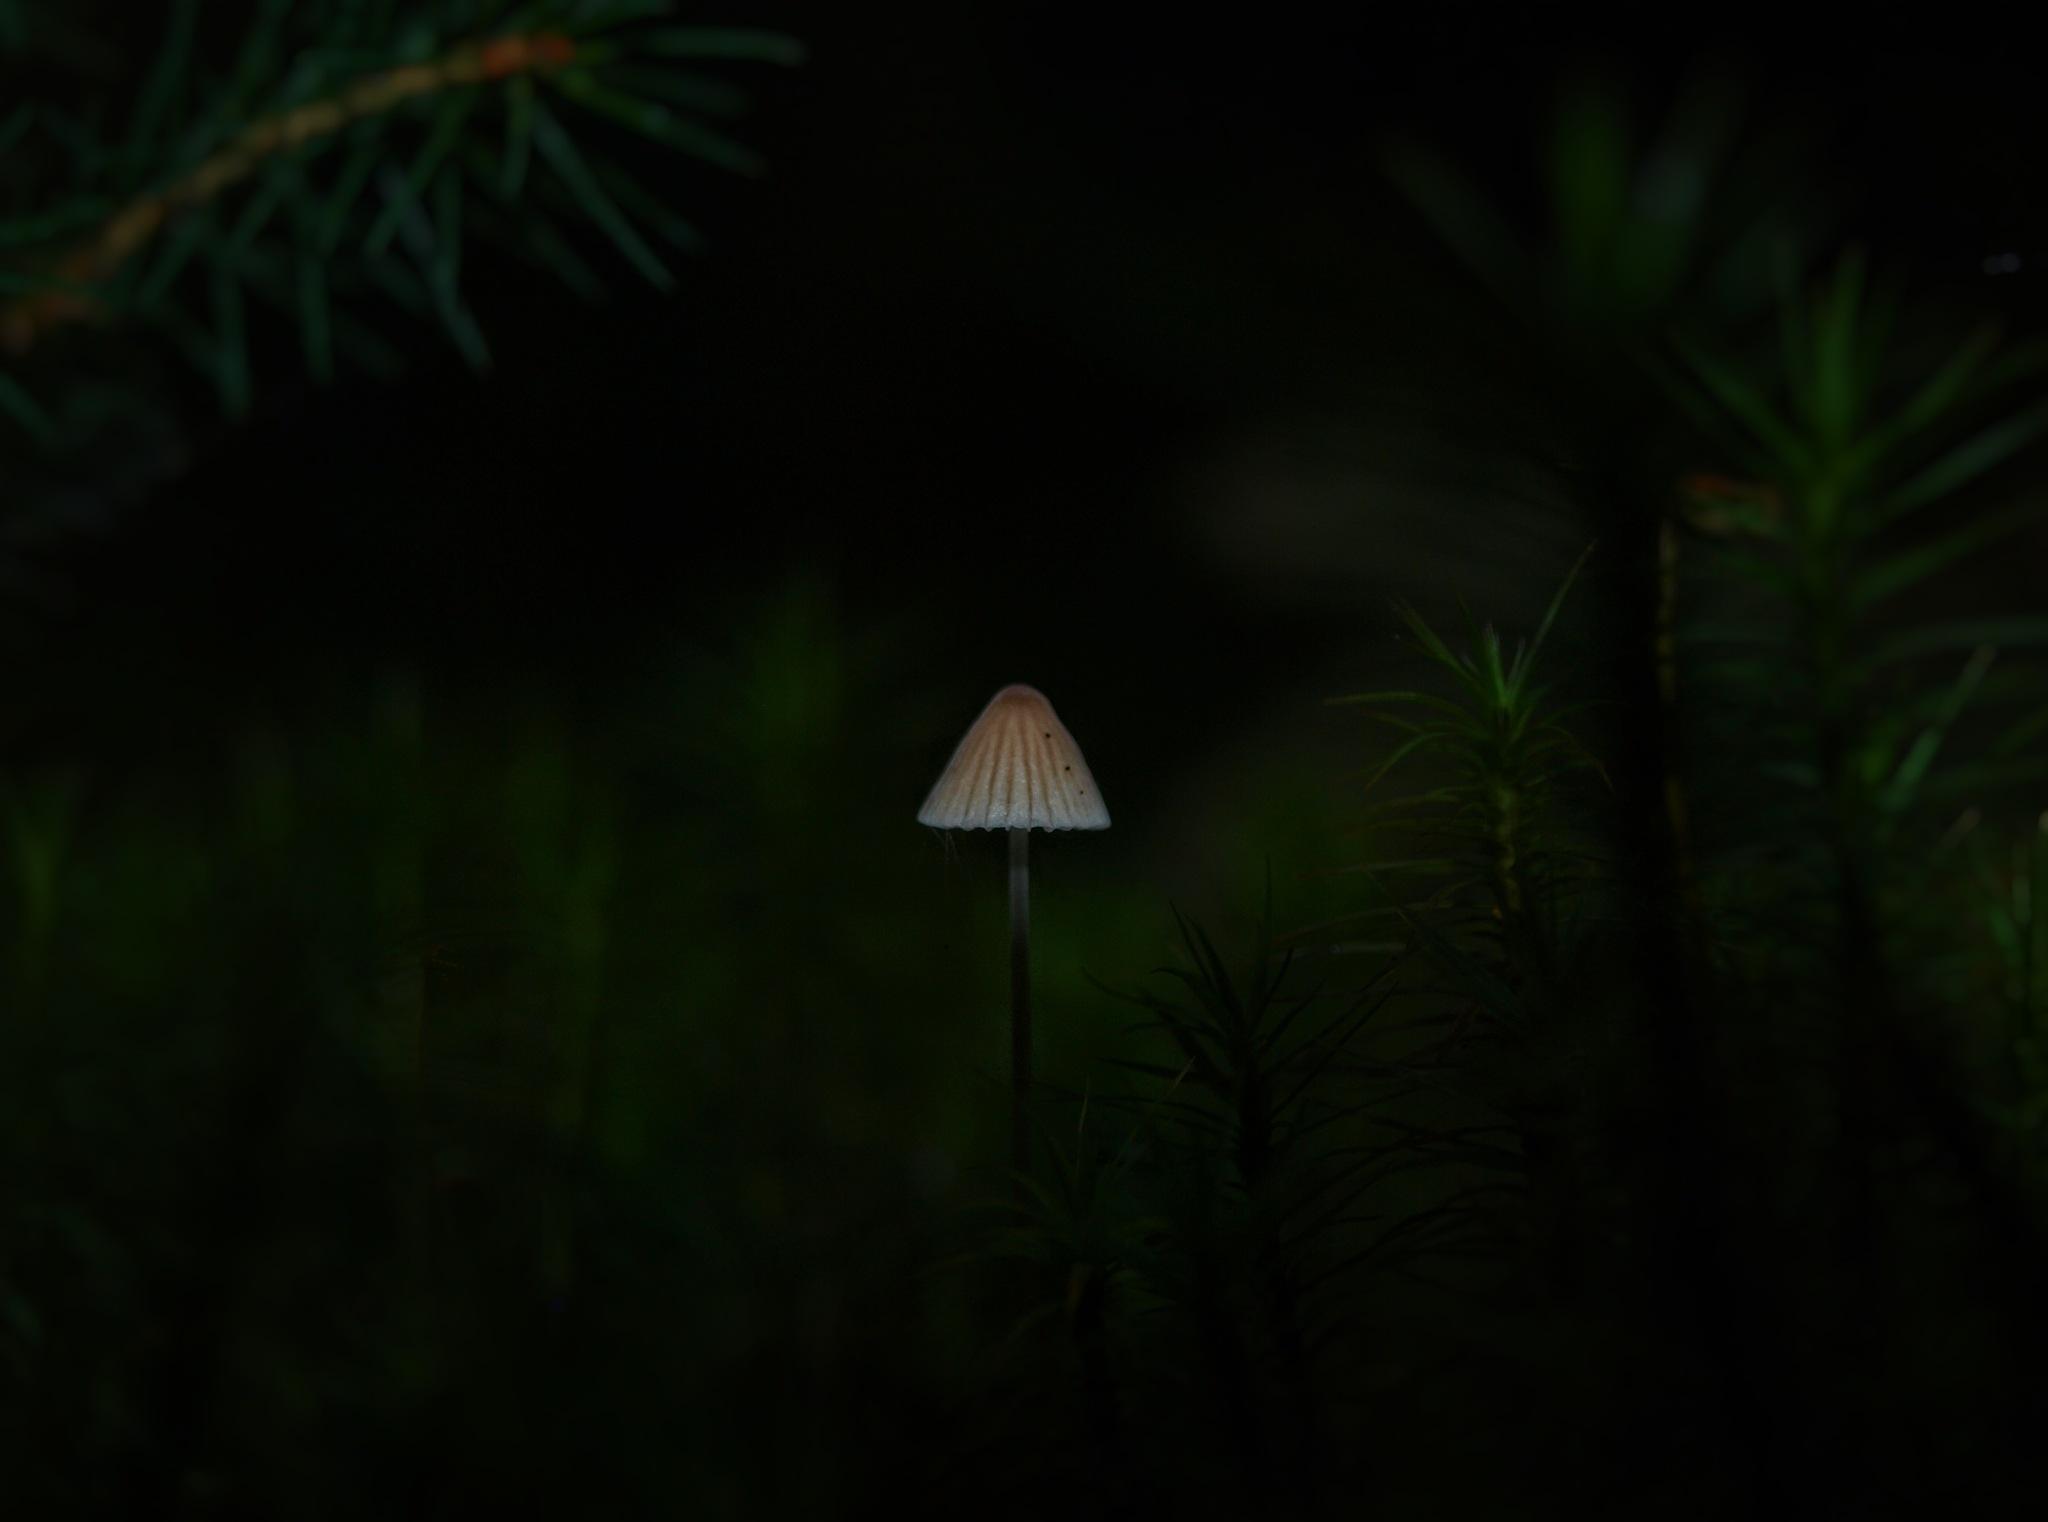 Alone... by Robert